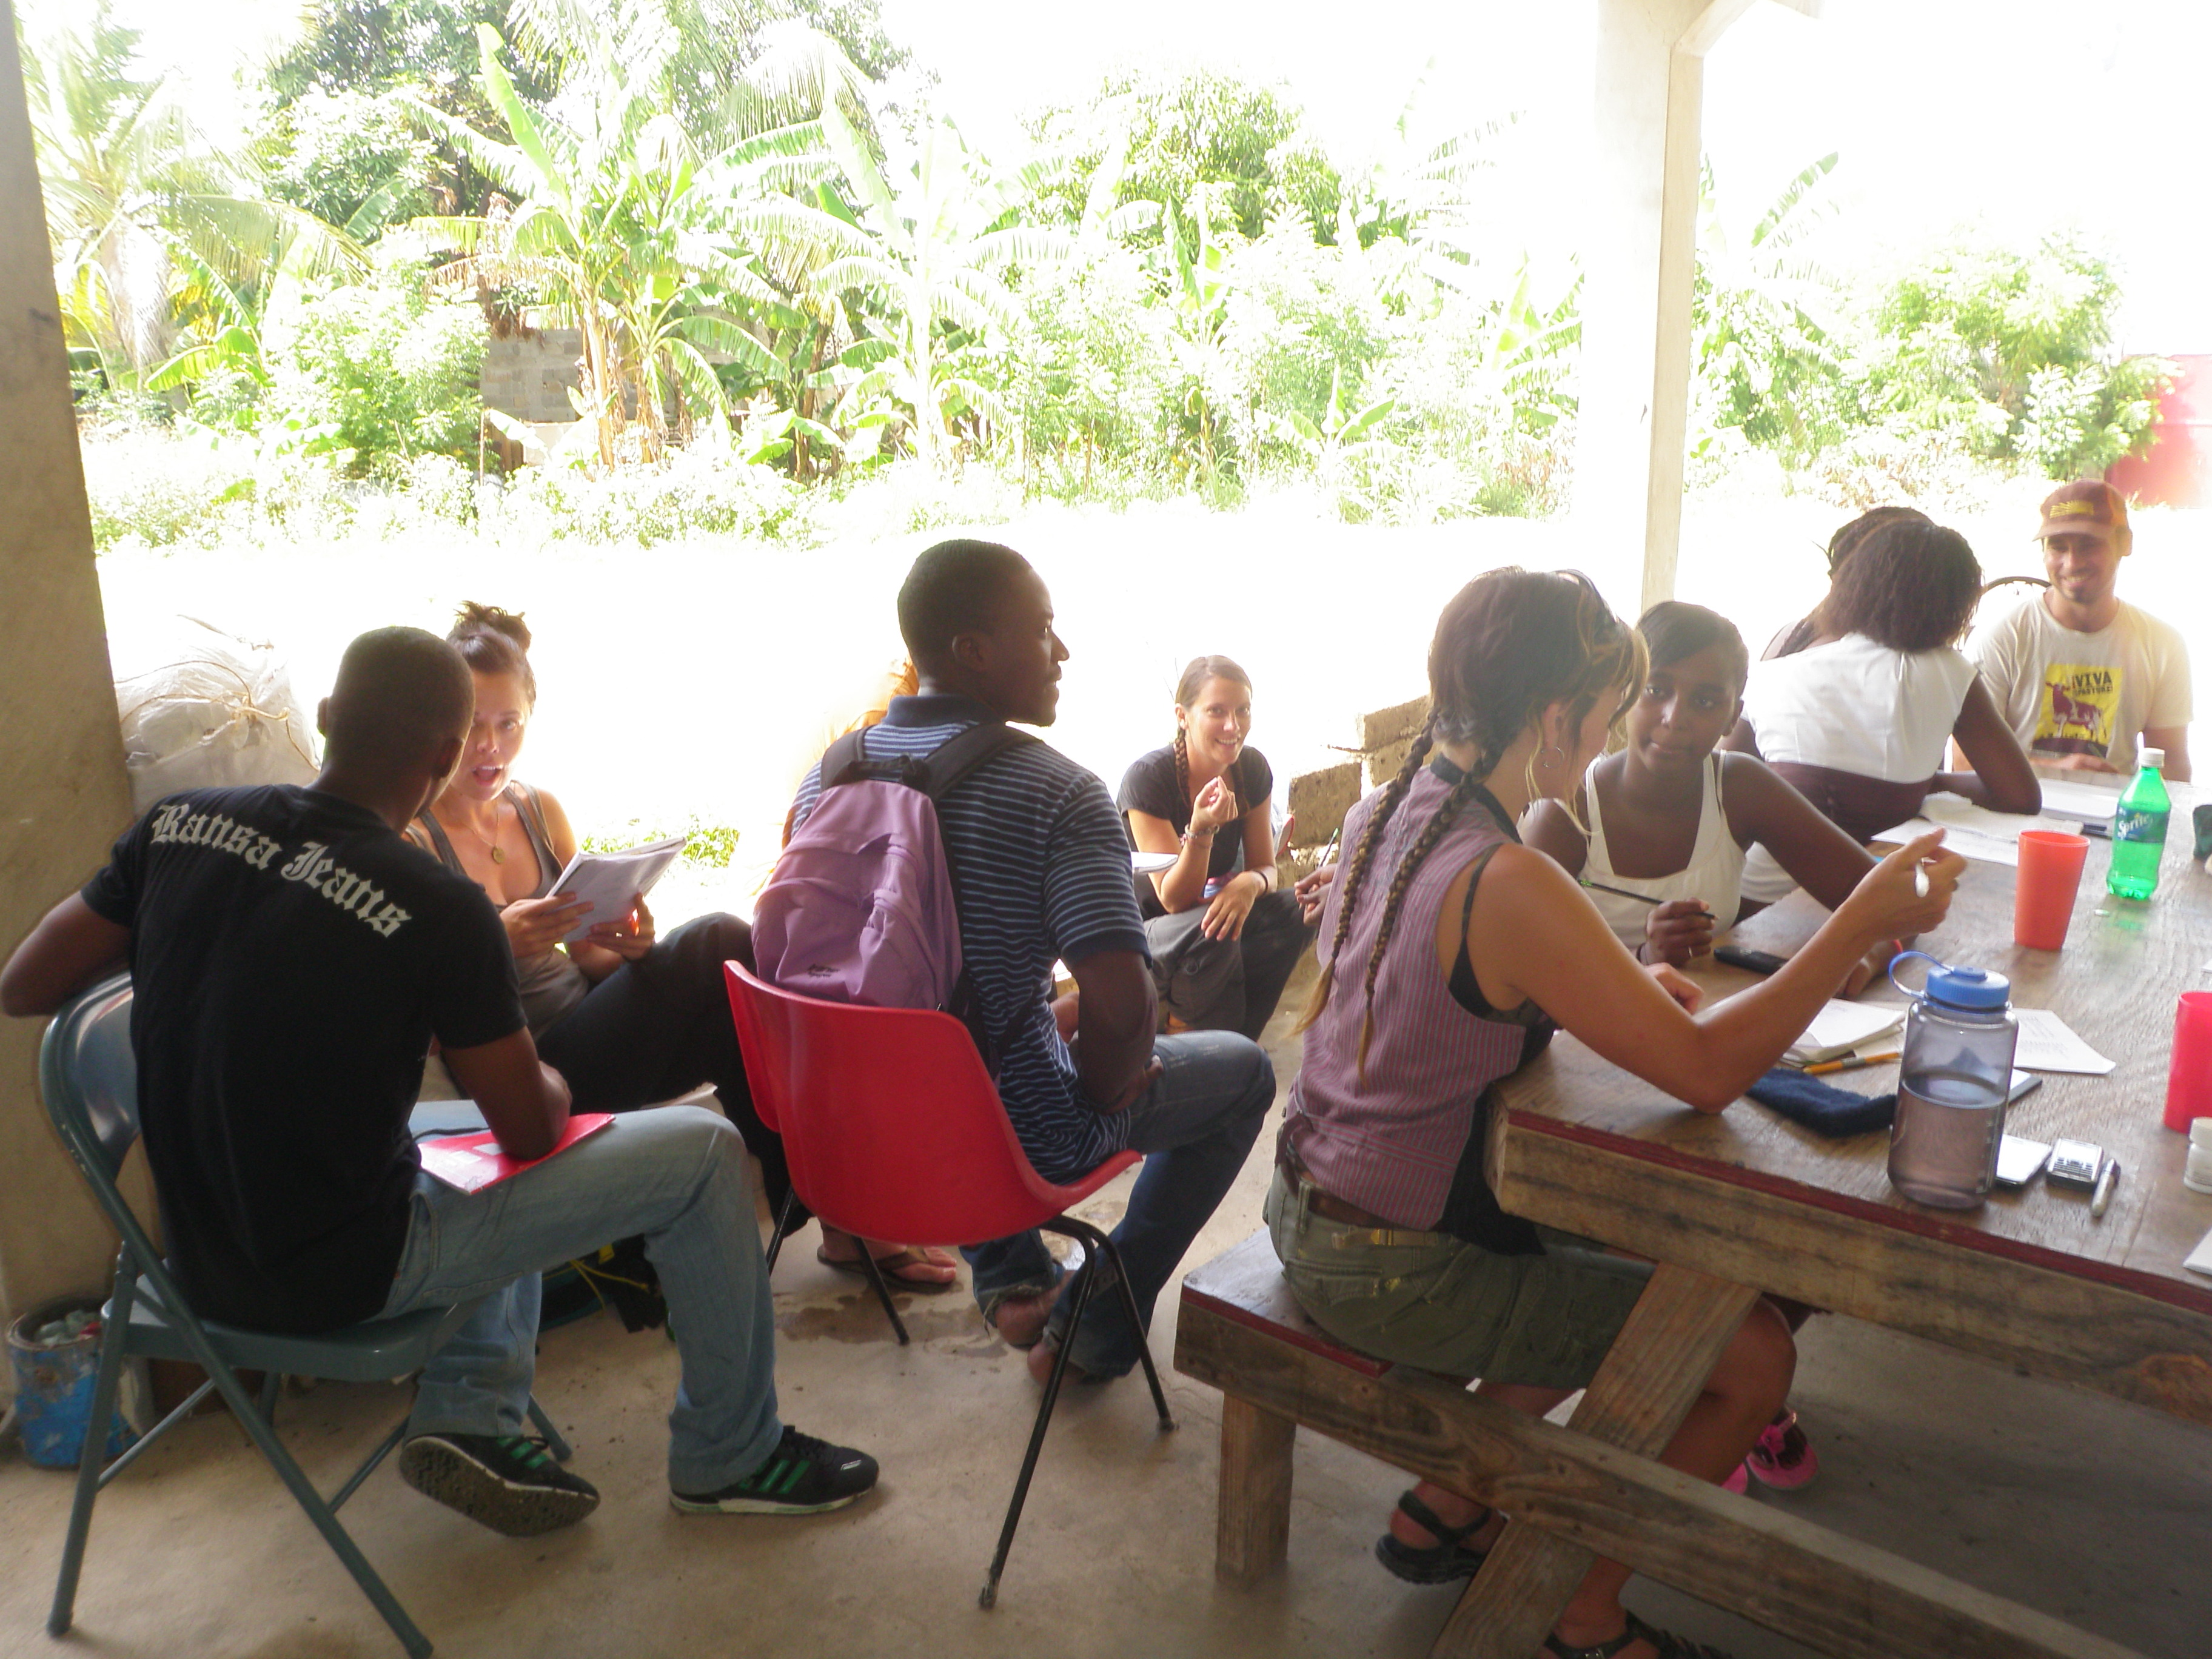 Original Volunteers Student Room Site Www Thestudentroom Co Uk